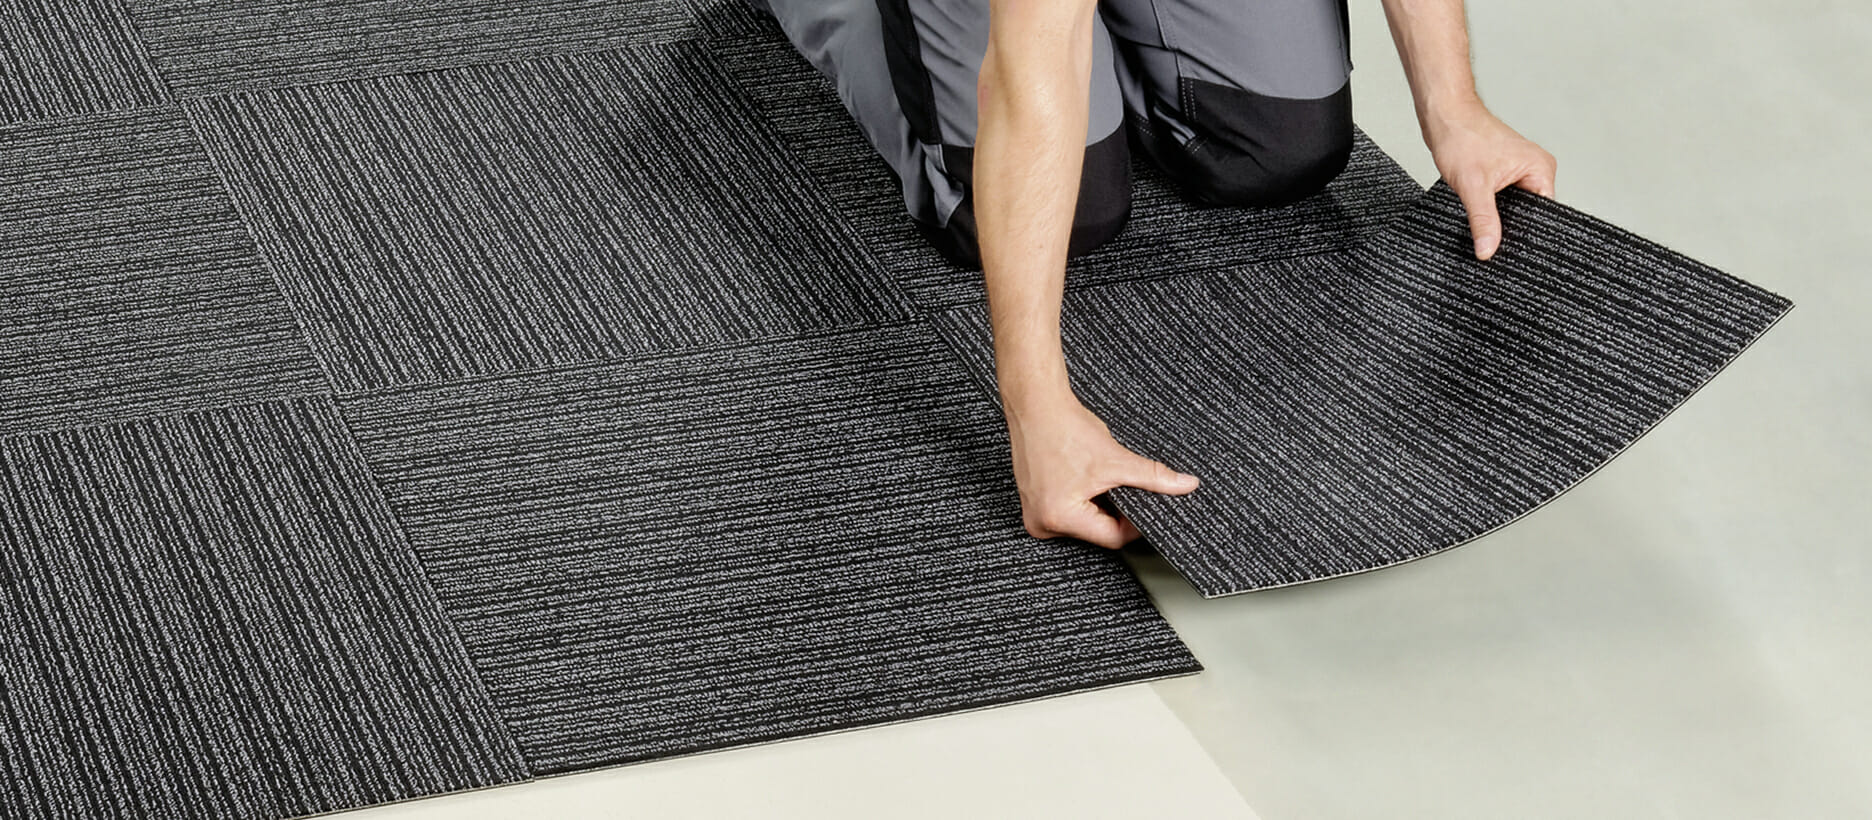 Carpet Tiles On Uneven Areas